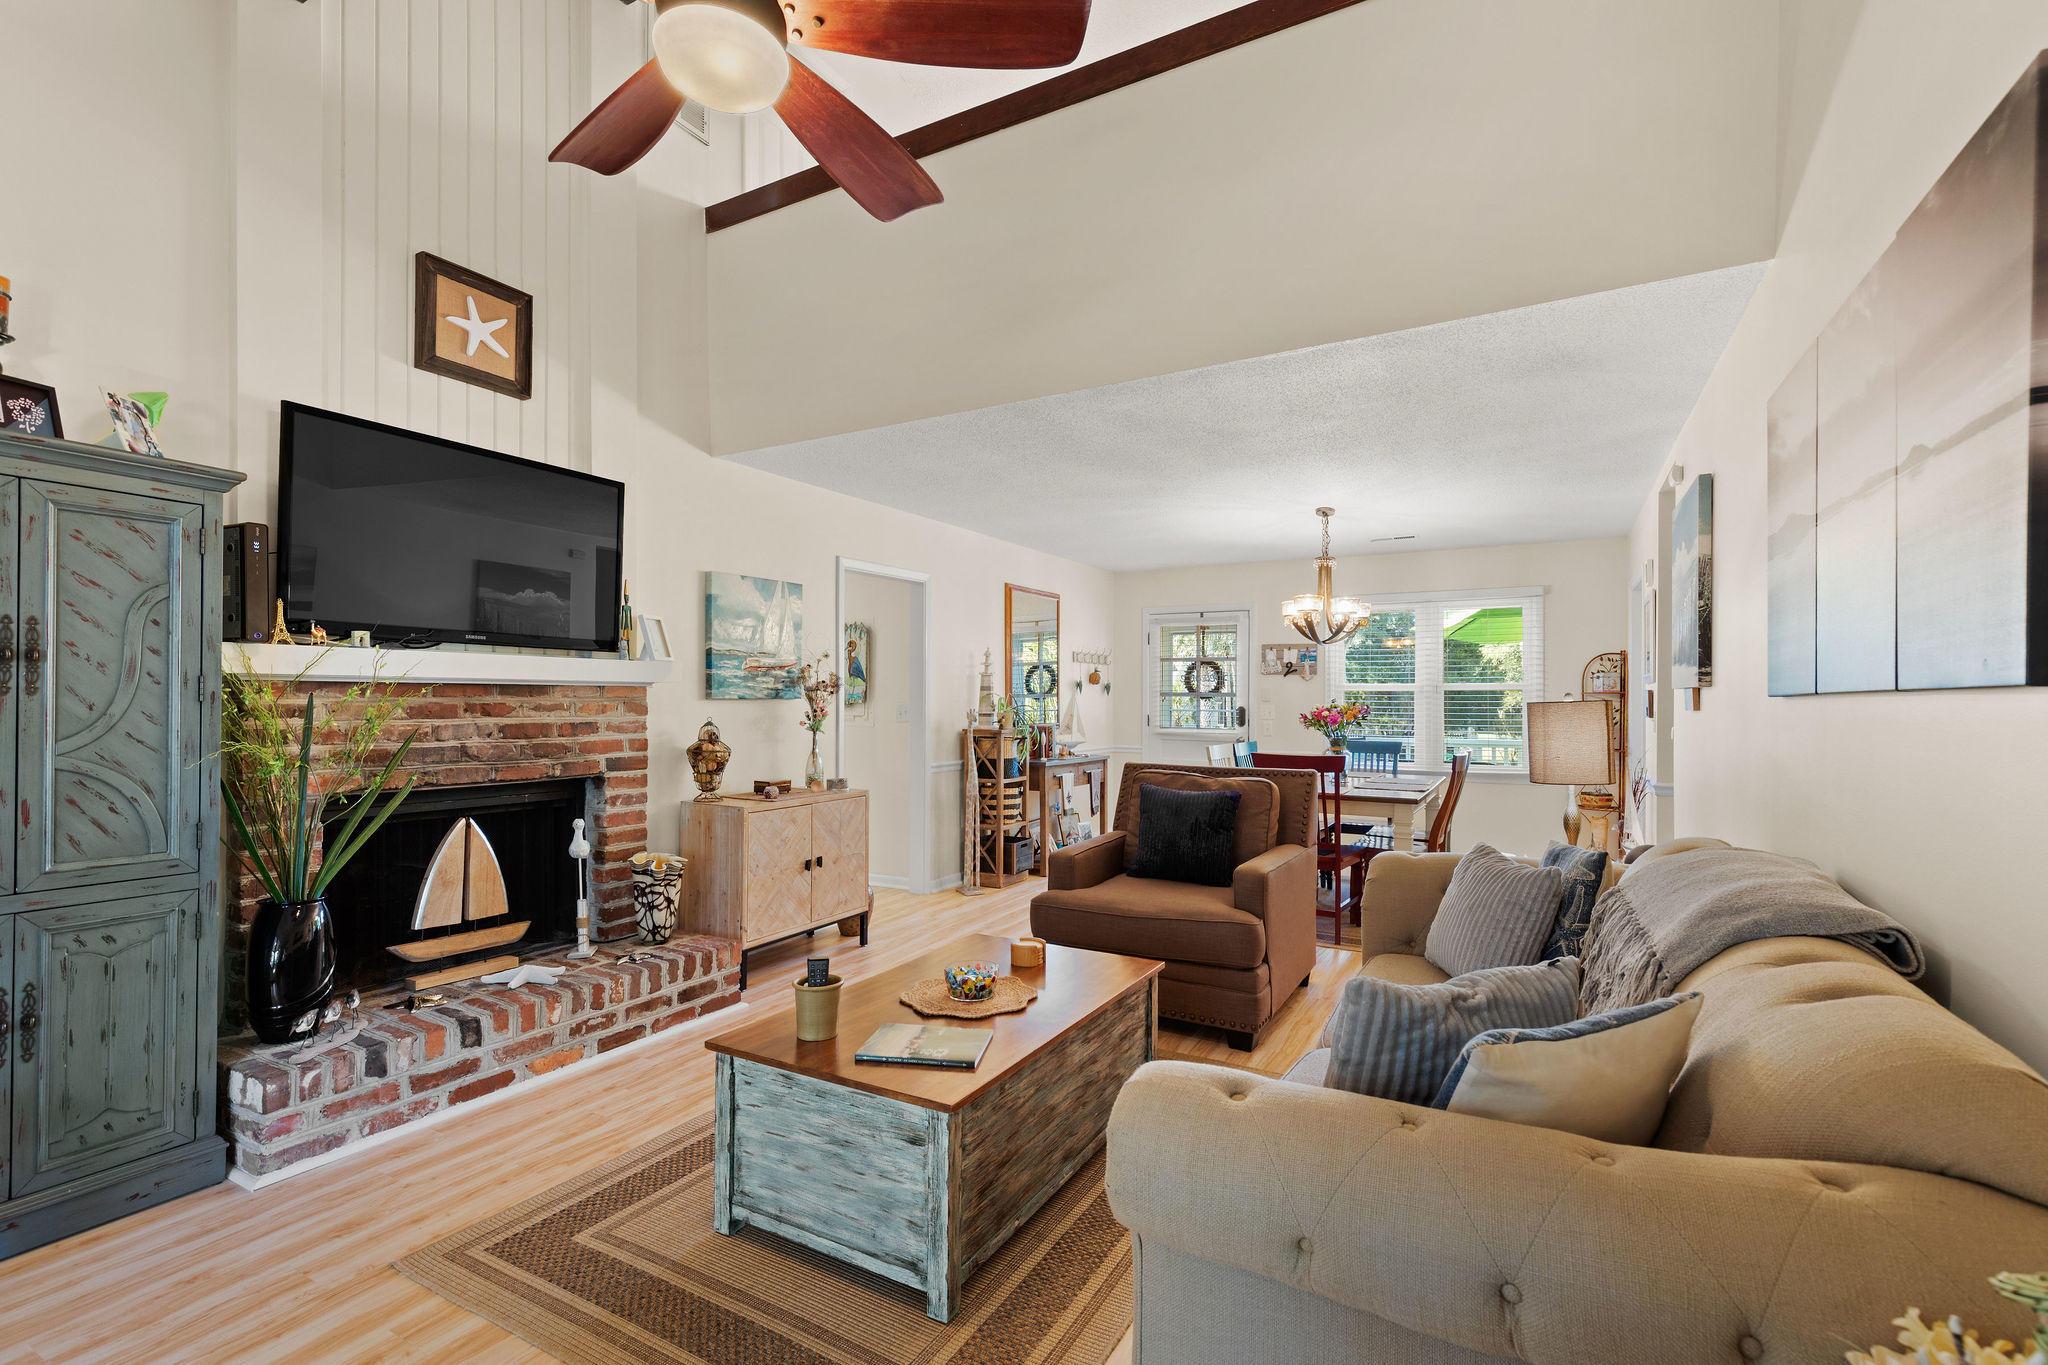 Seabrook Island Homes For Sale - 515 Cobby Creek, Seabrook Island, SC - 36